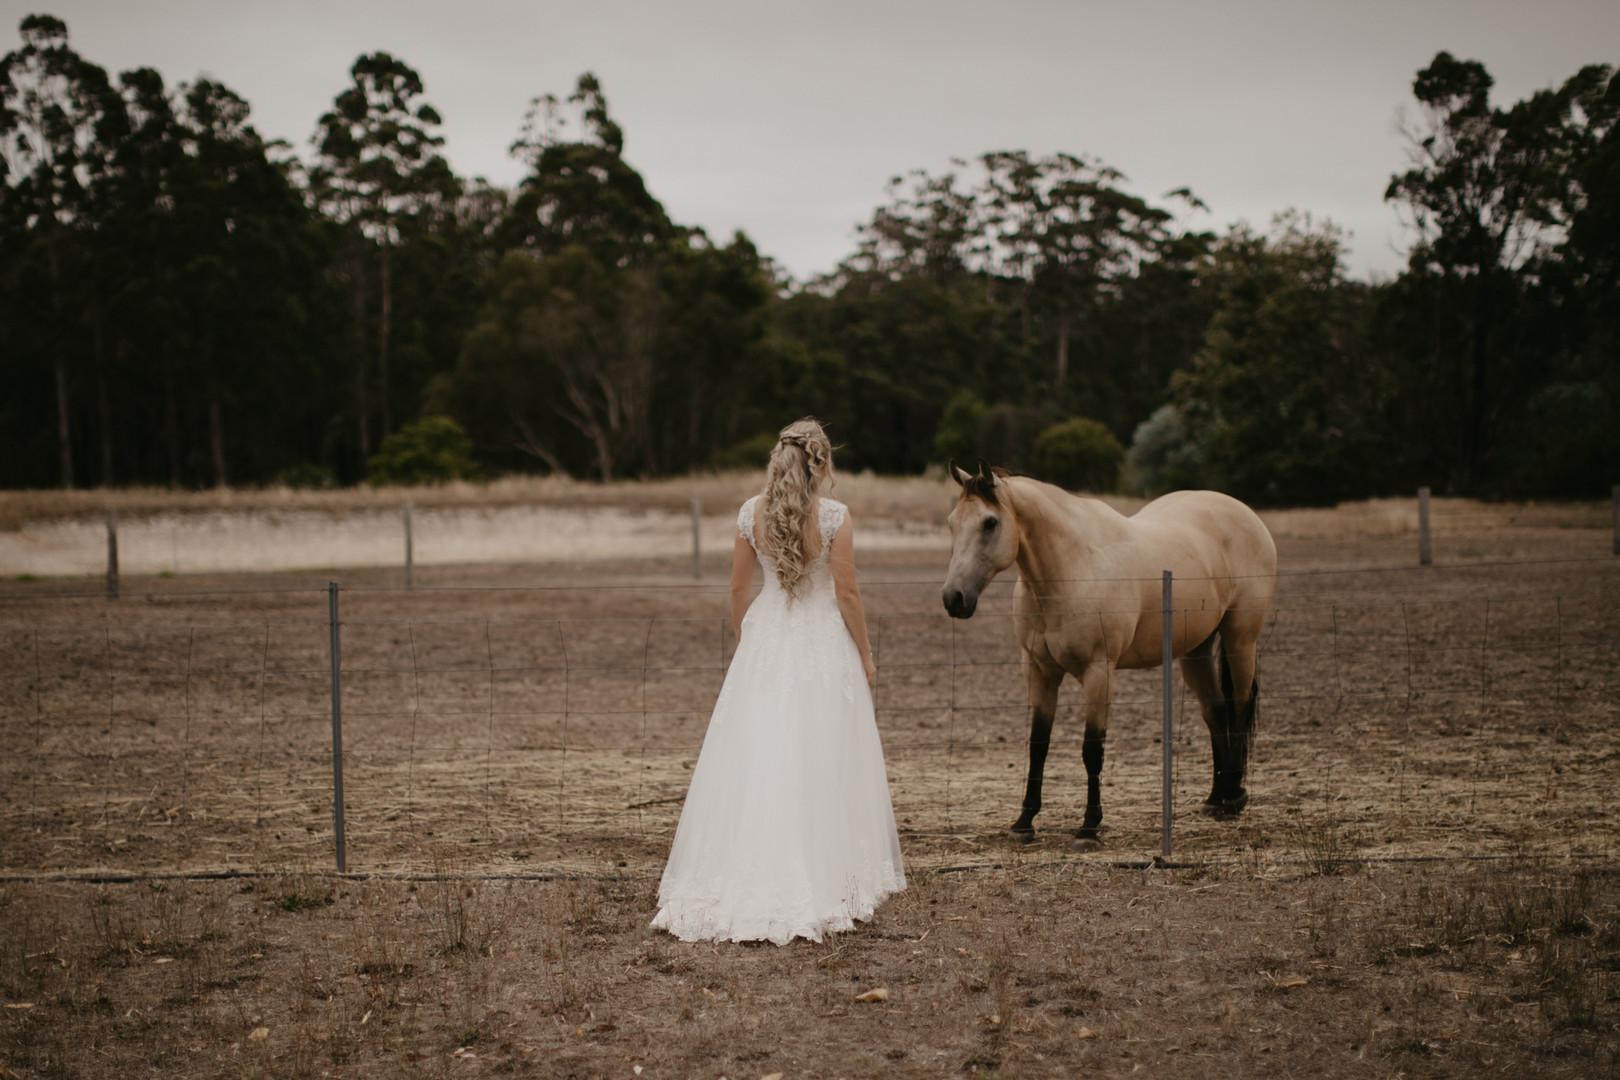 Victoria Baker Photographer